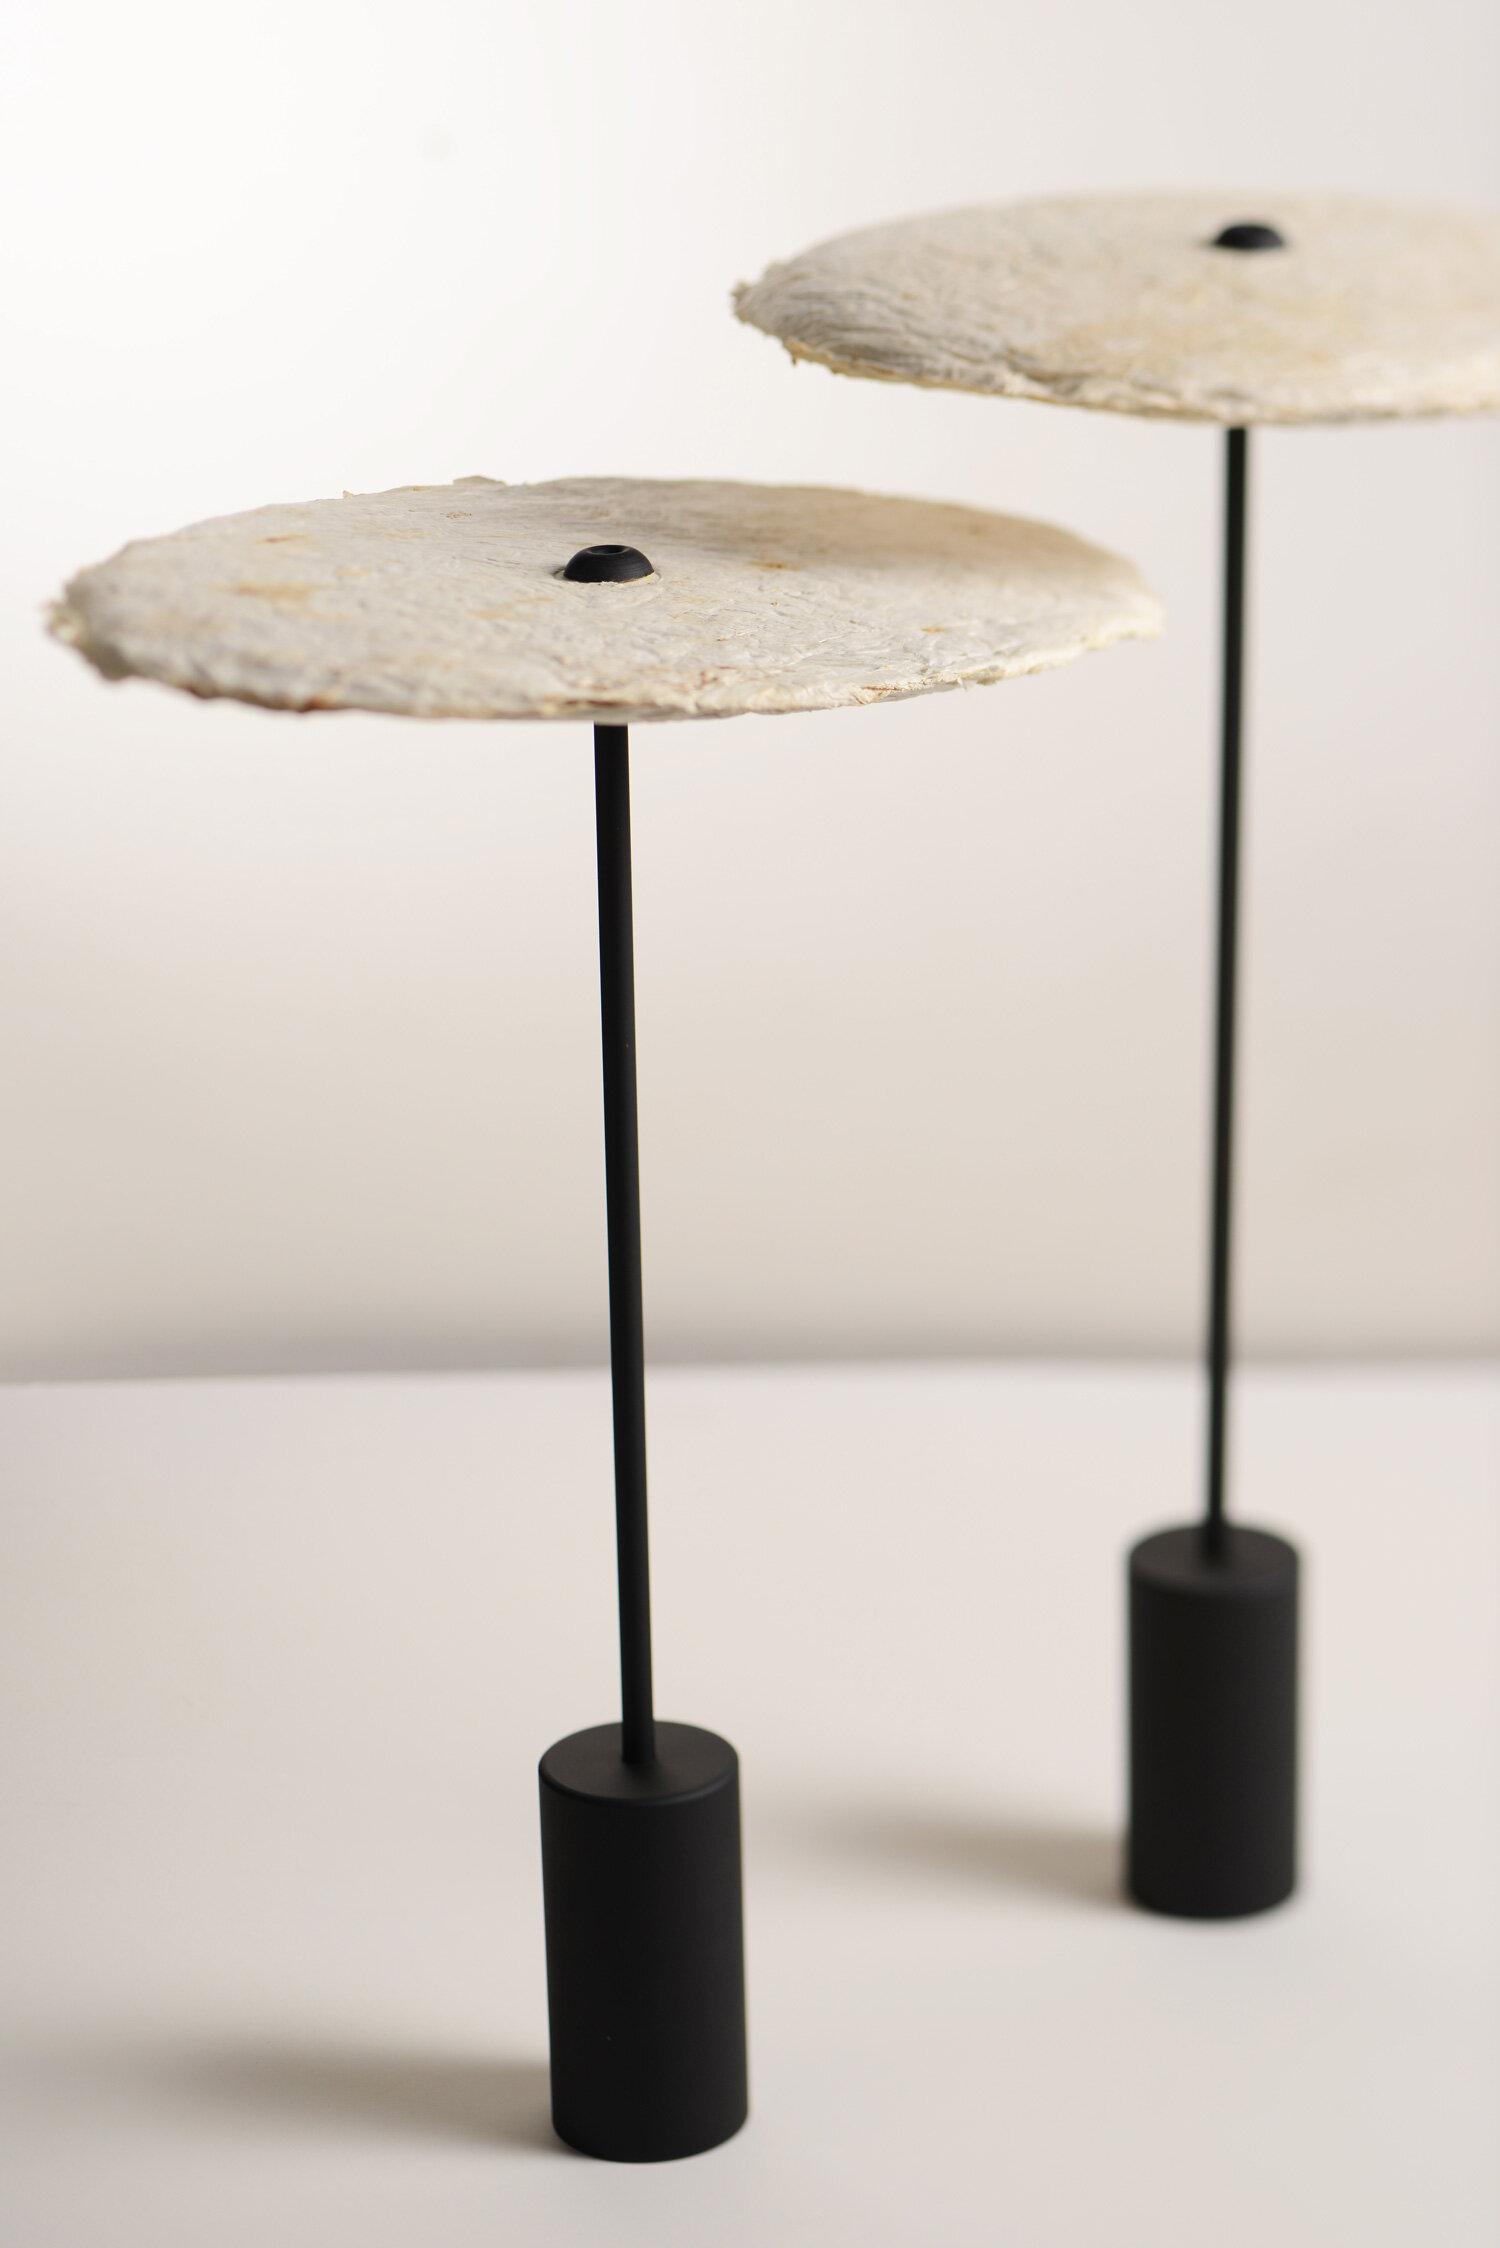 Mycelium Lights-Nir Meiri Studio-Visual Atelier 8-Design-4.jpg